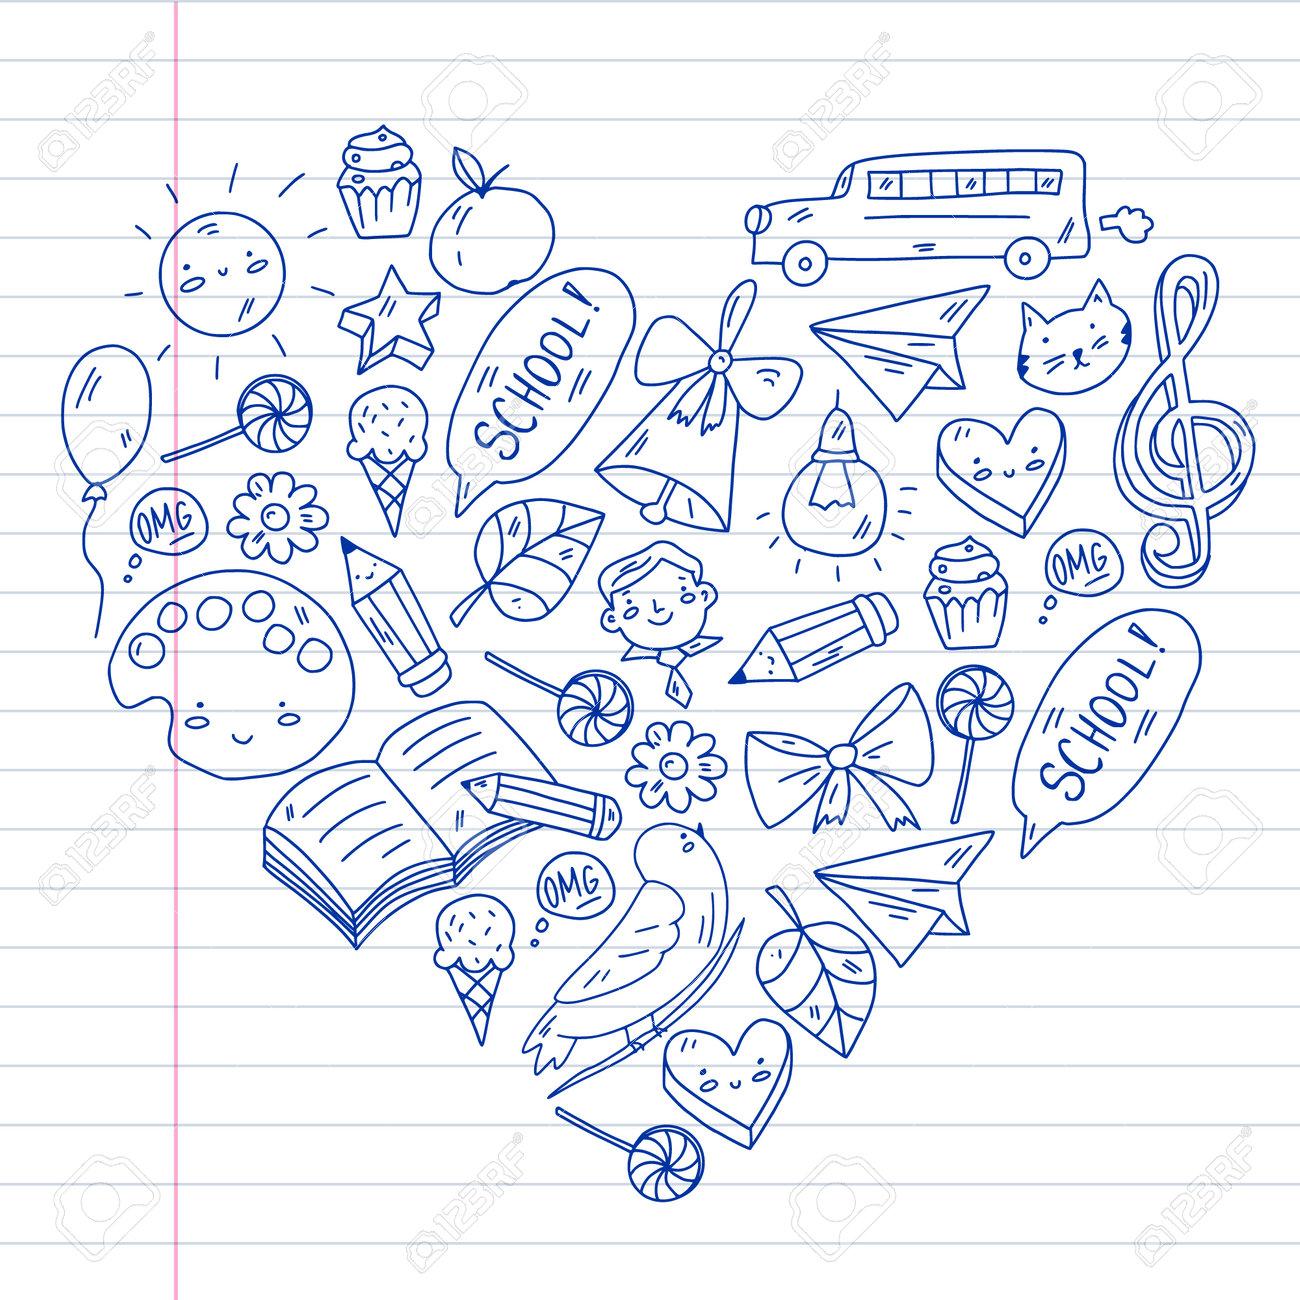 School, kindergarten with cute vector children. Creativity and imagination. Dancing, singing, painting, online education. - 173370772